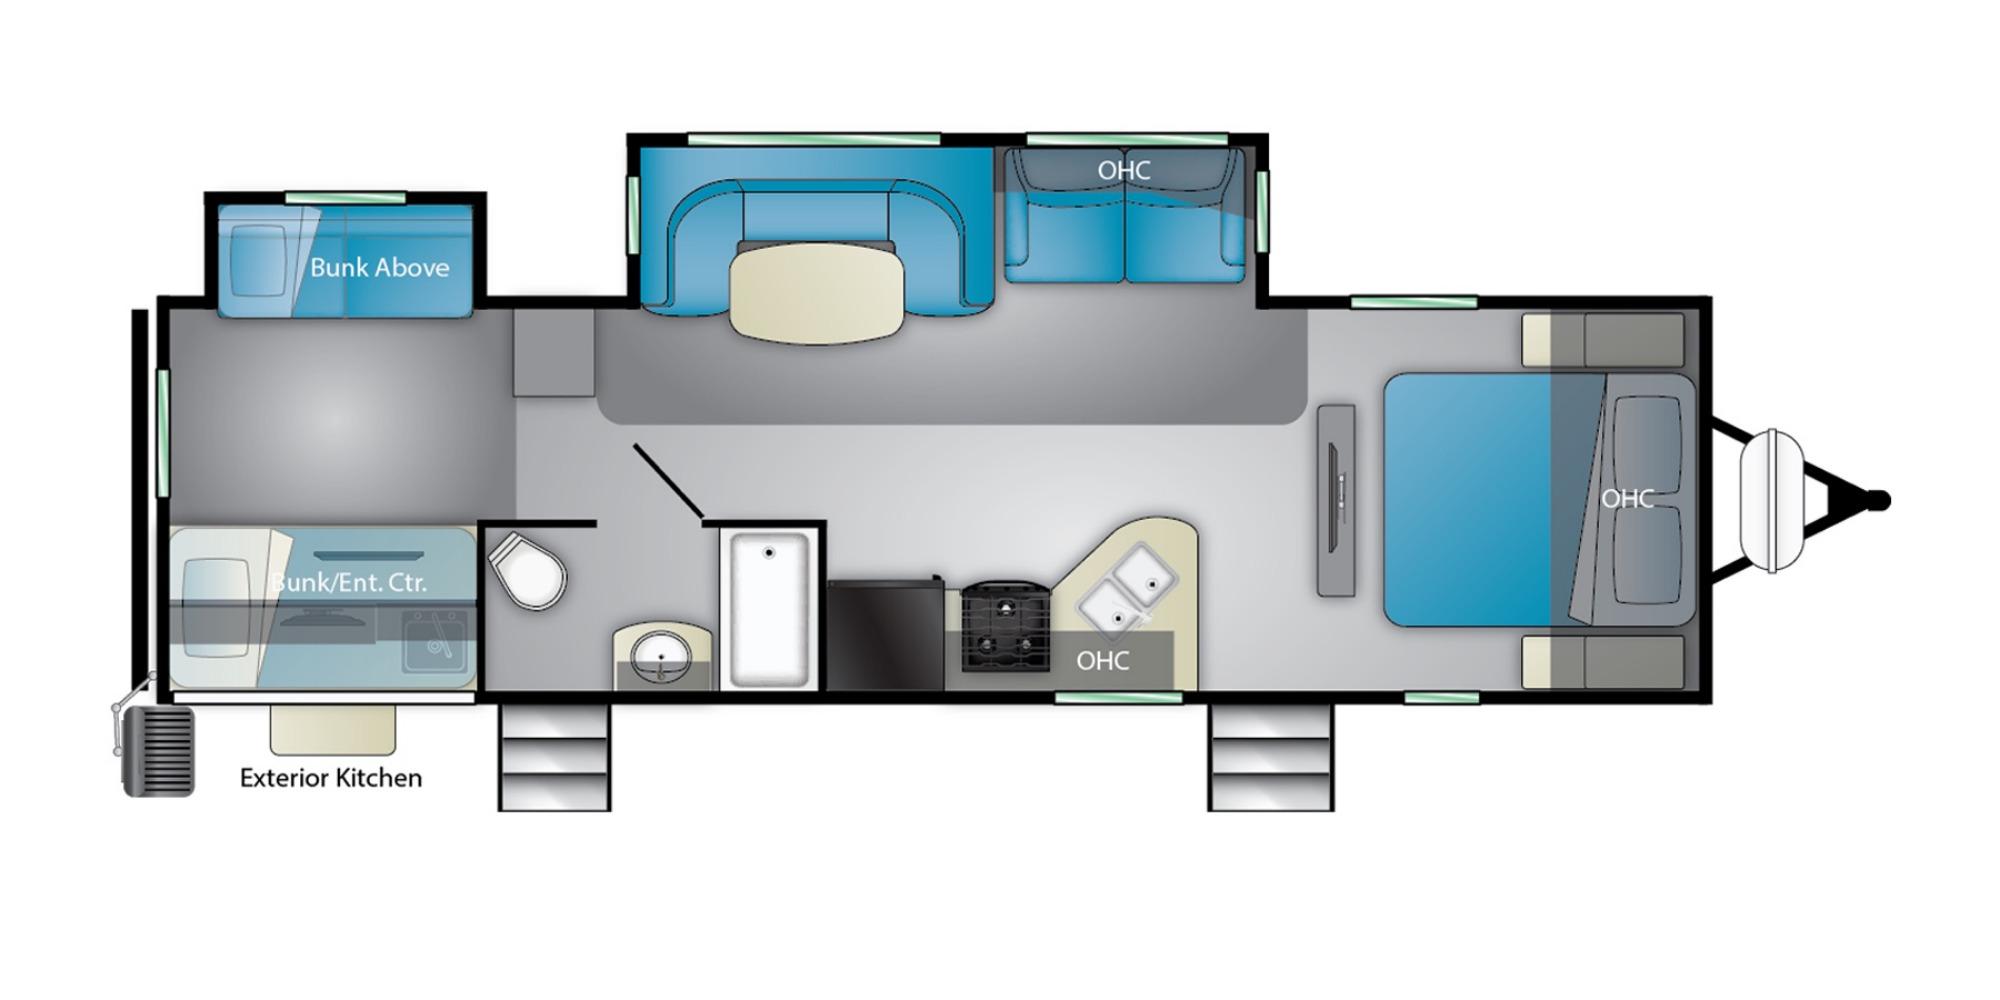 View Floor Plan for 2022 HEARTLAND MALLARD M32